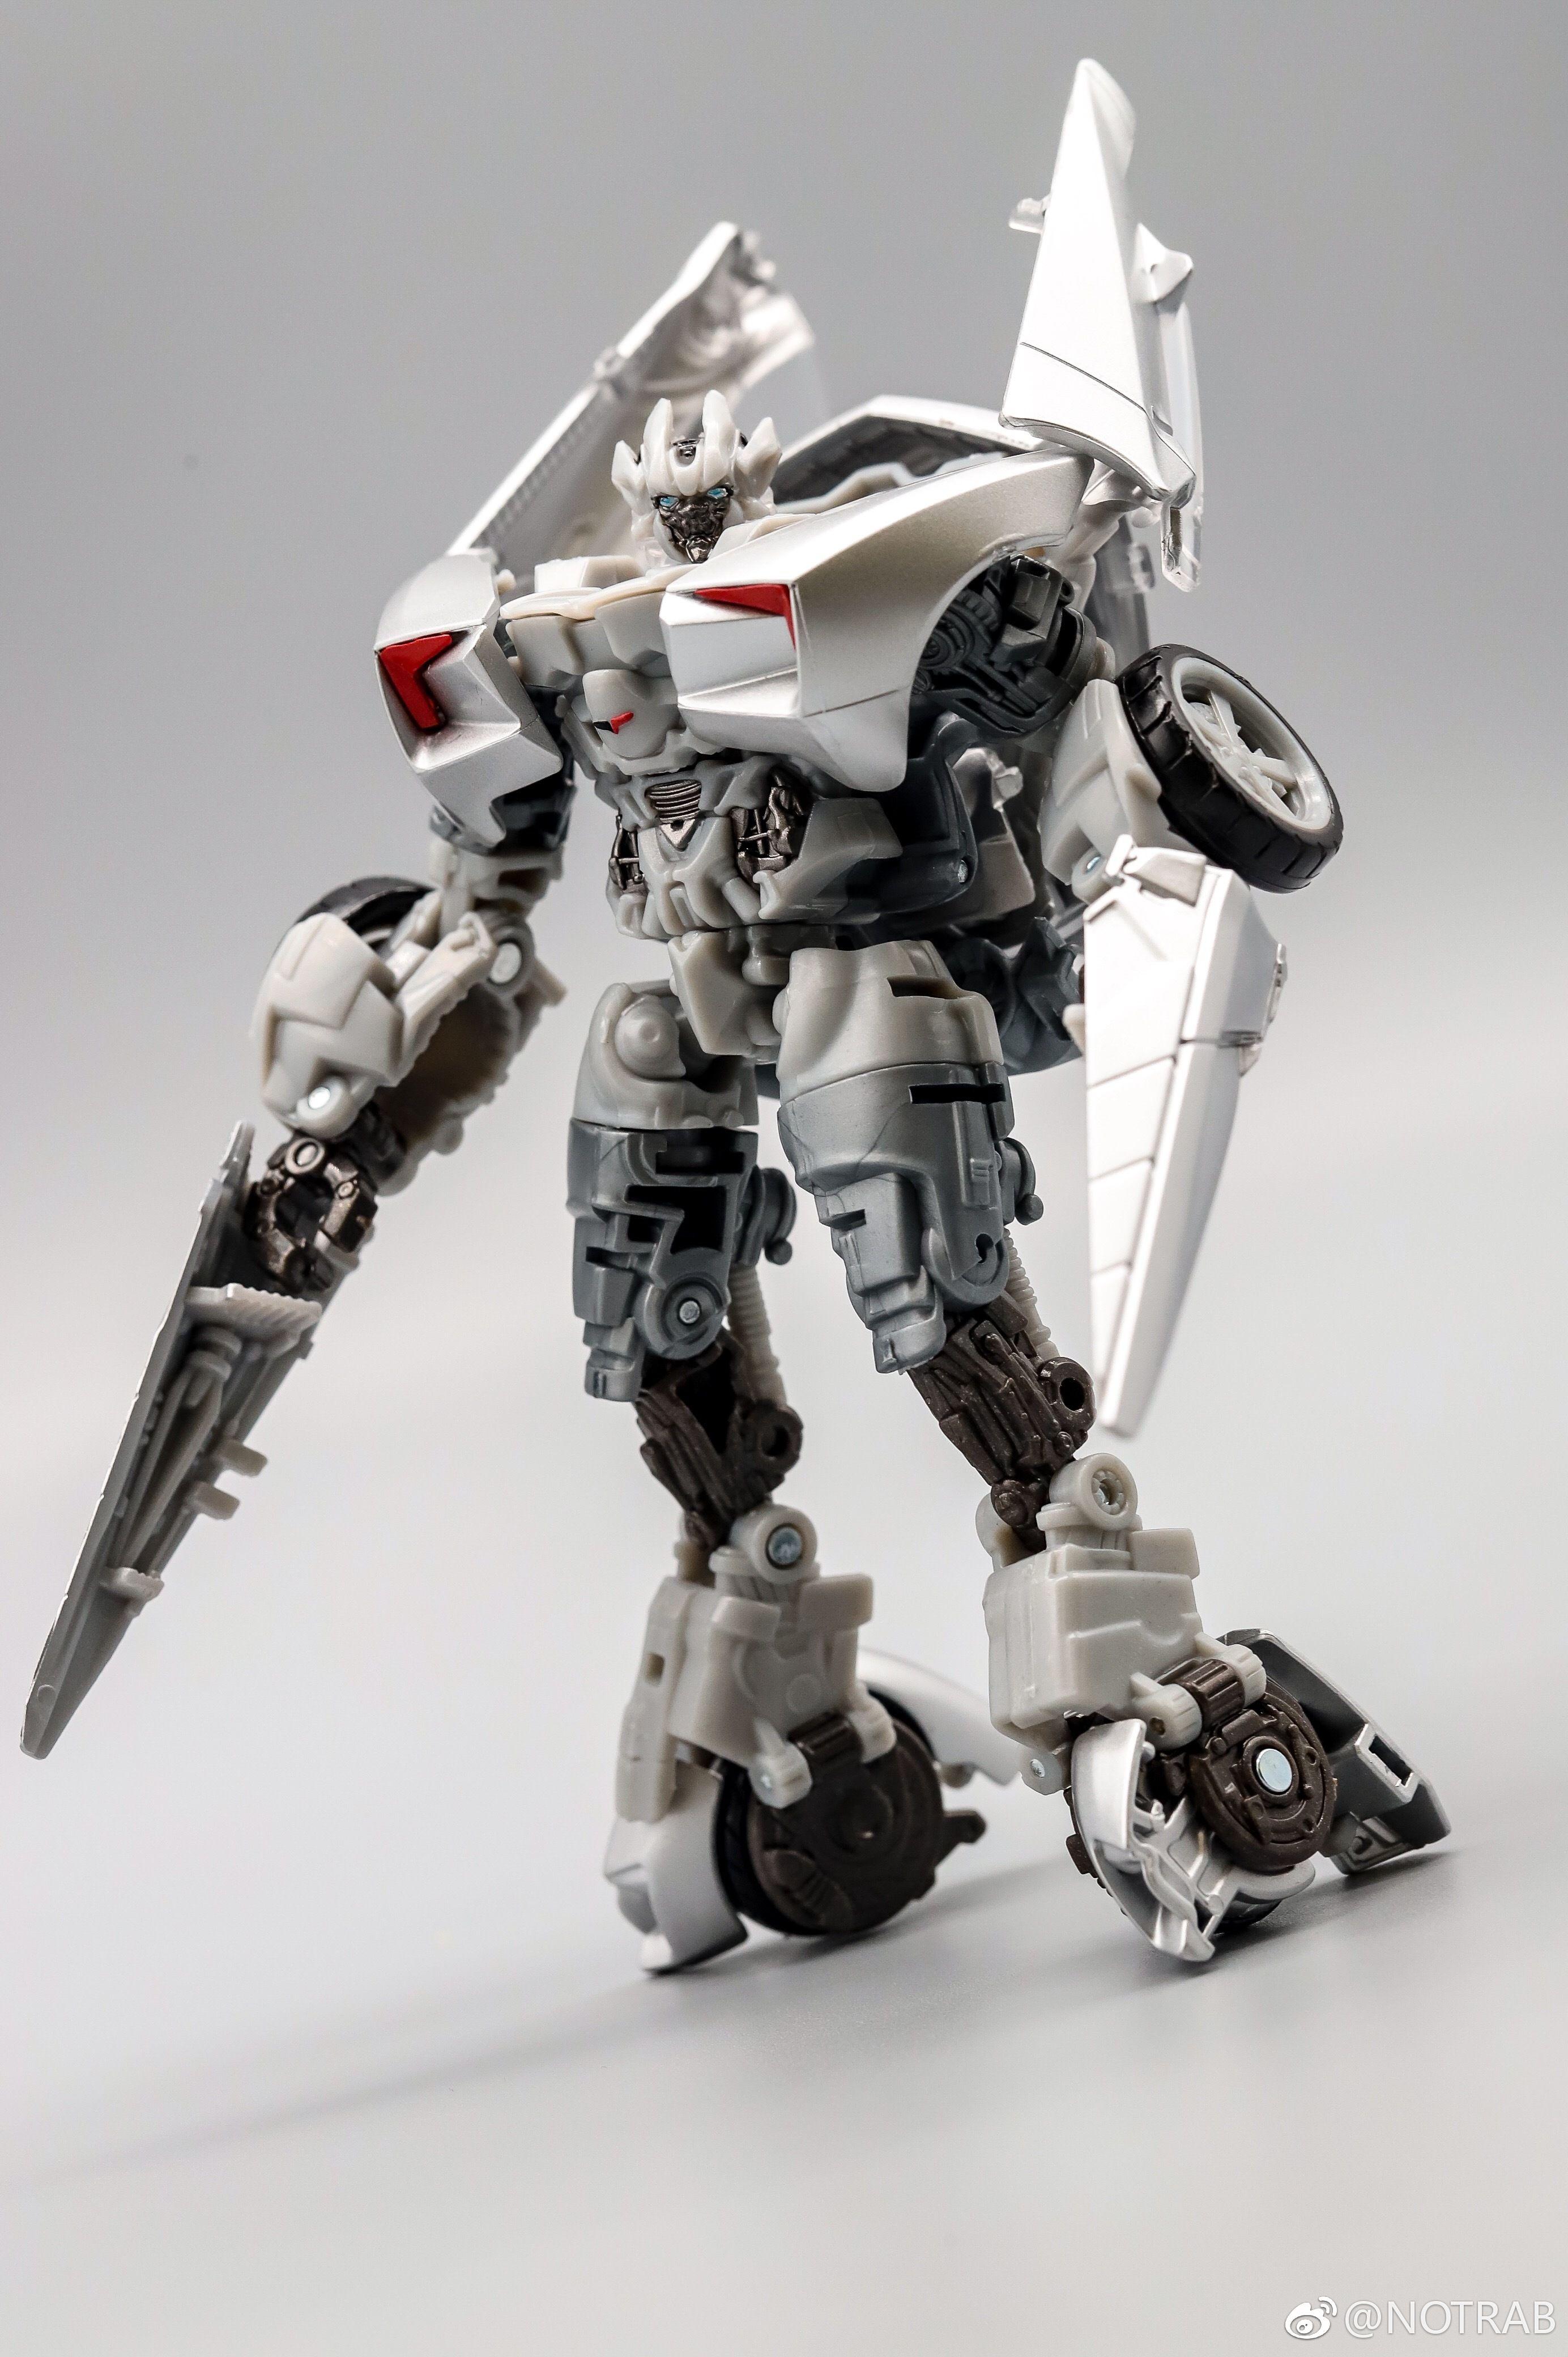 Transformers Hasbro Takara Tomy Studio Series SS-29 SideSwipe Action Figure New